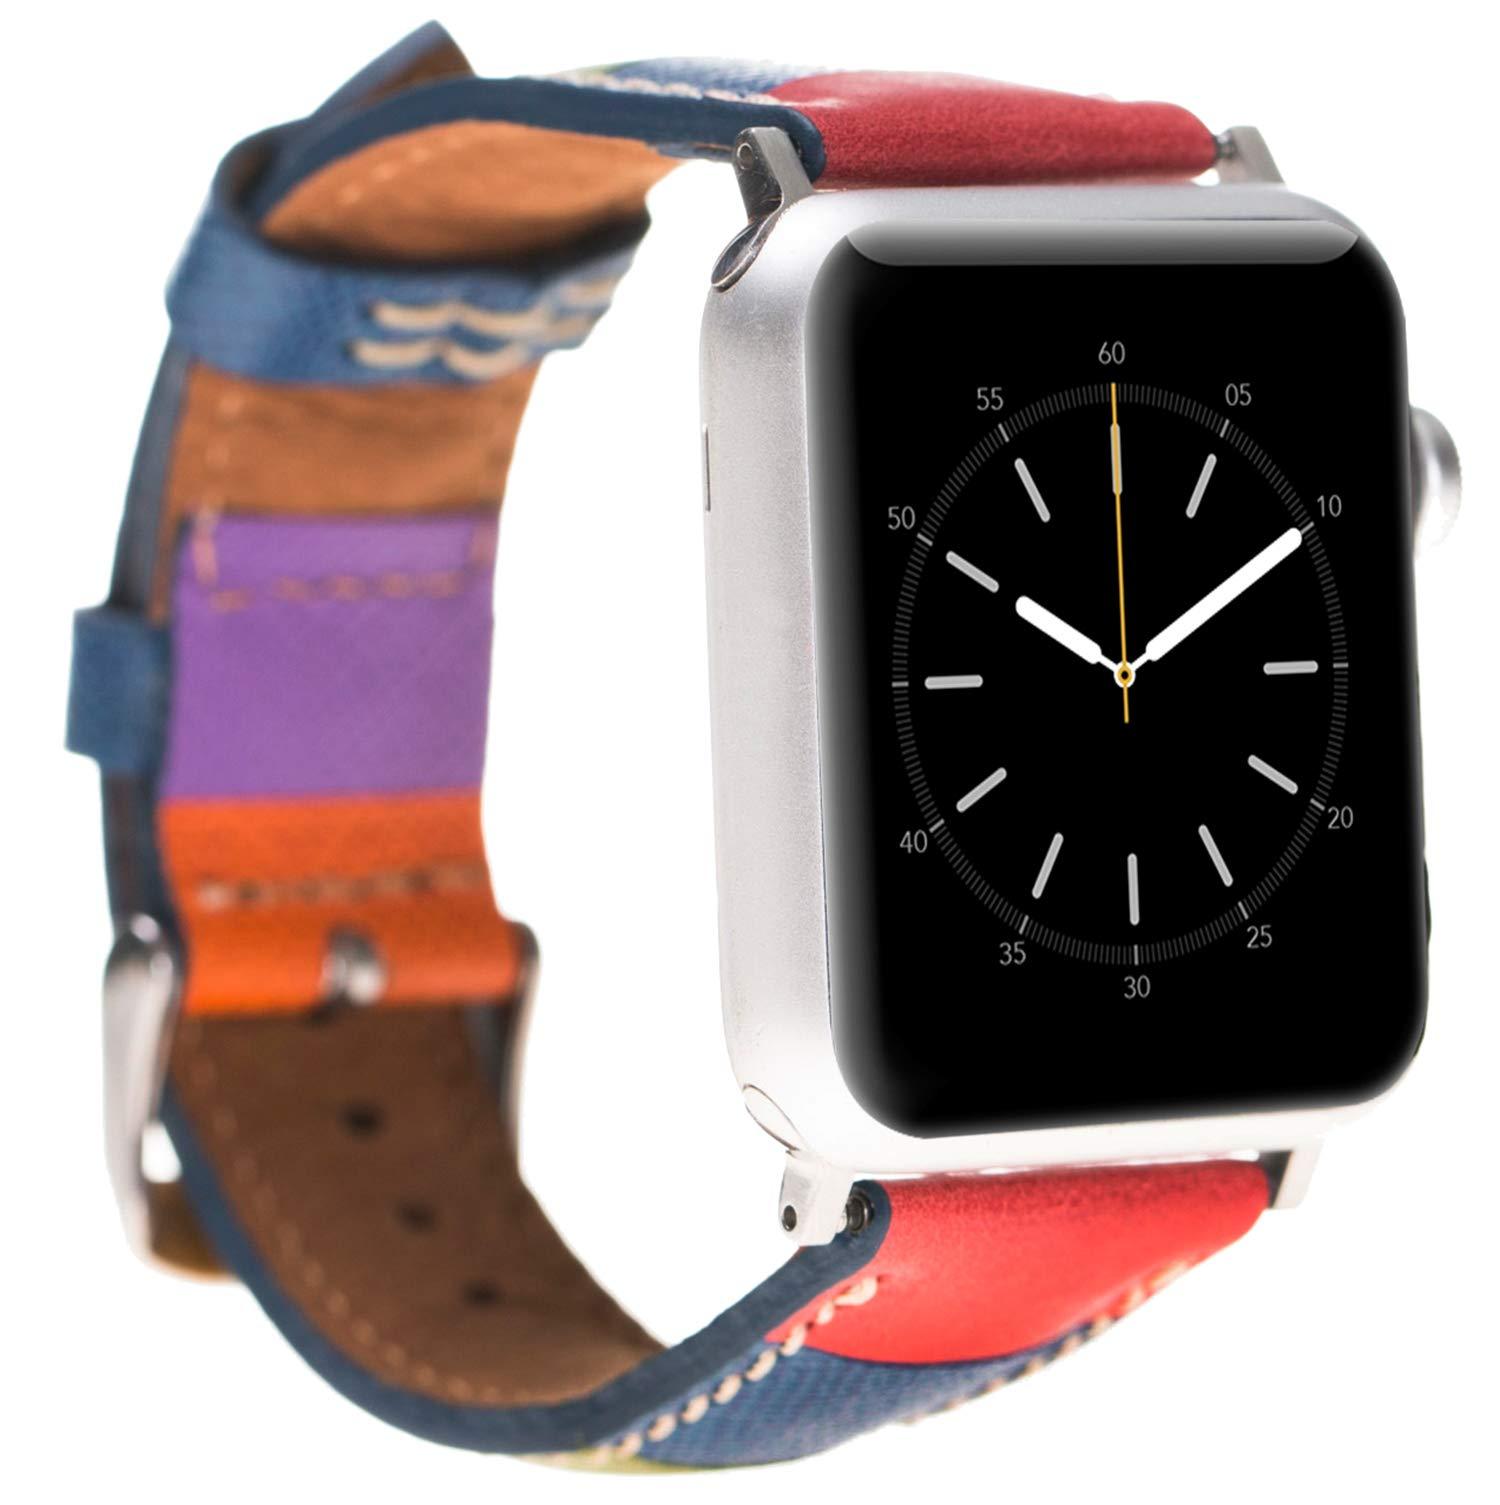 Burkley-Lederarmband-fr-Apple-Watch-12-34-Uhrenarmband-Ersatzband-inkl-42-mm-Connector-fr-die-Apple-Watch